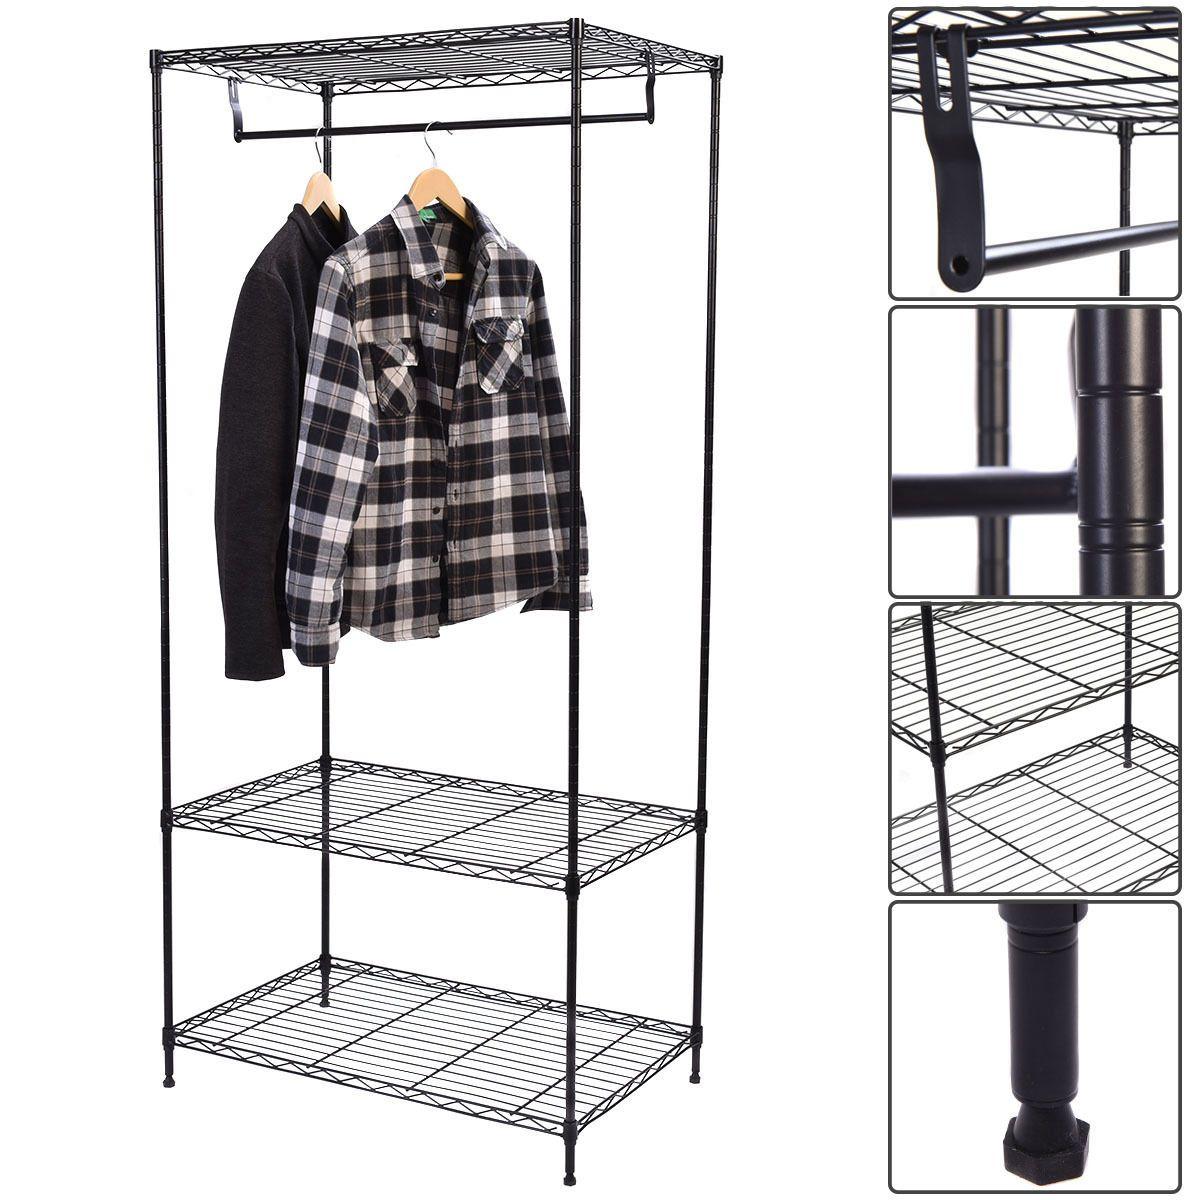 3-Tier Clothing Garment Rack Hanger Shelving Wire Shelf Dress ...